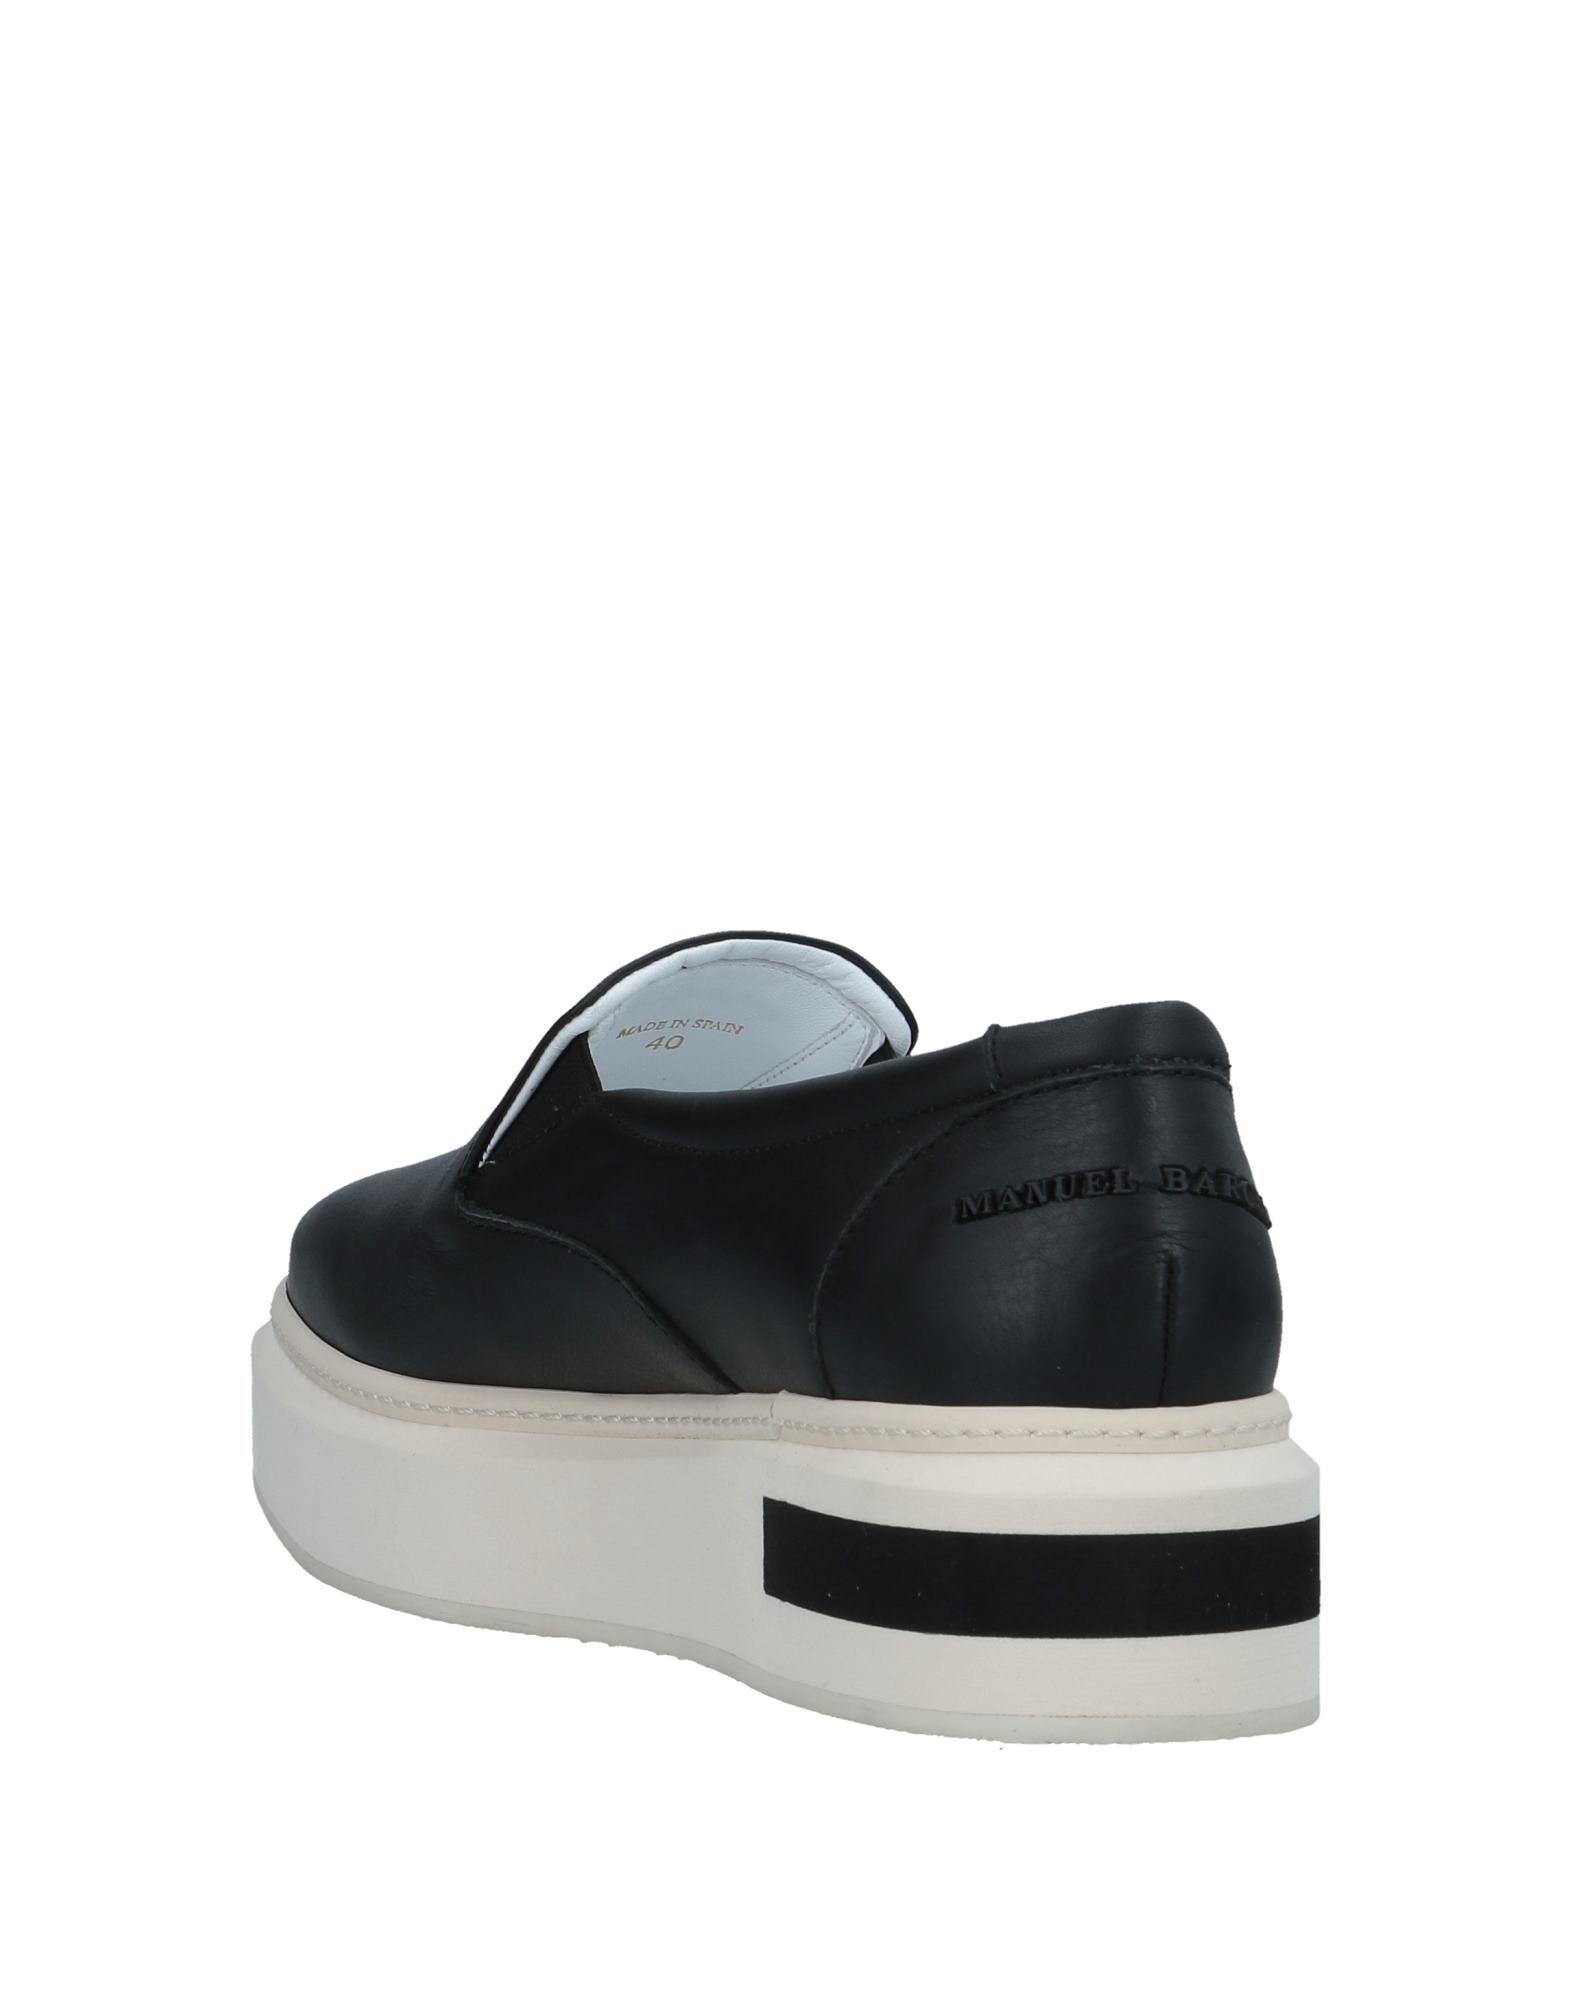 Paloma Barceló Sneakers Damen 11523545FE  11523545FE Damen 0fbf19